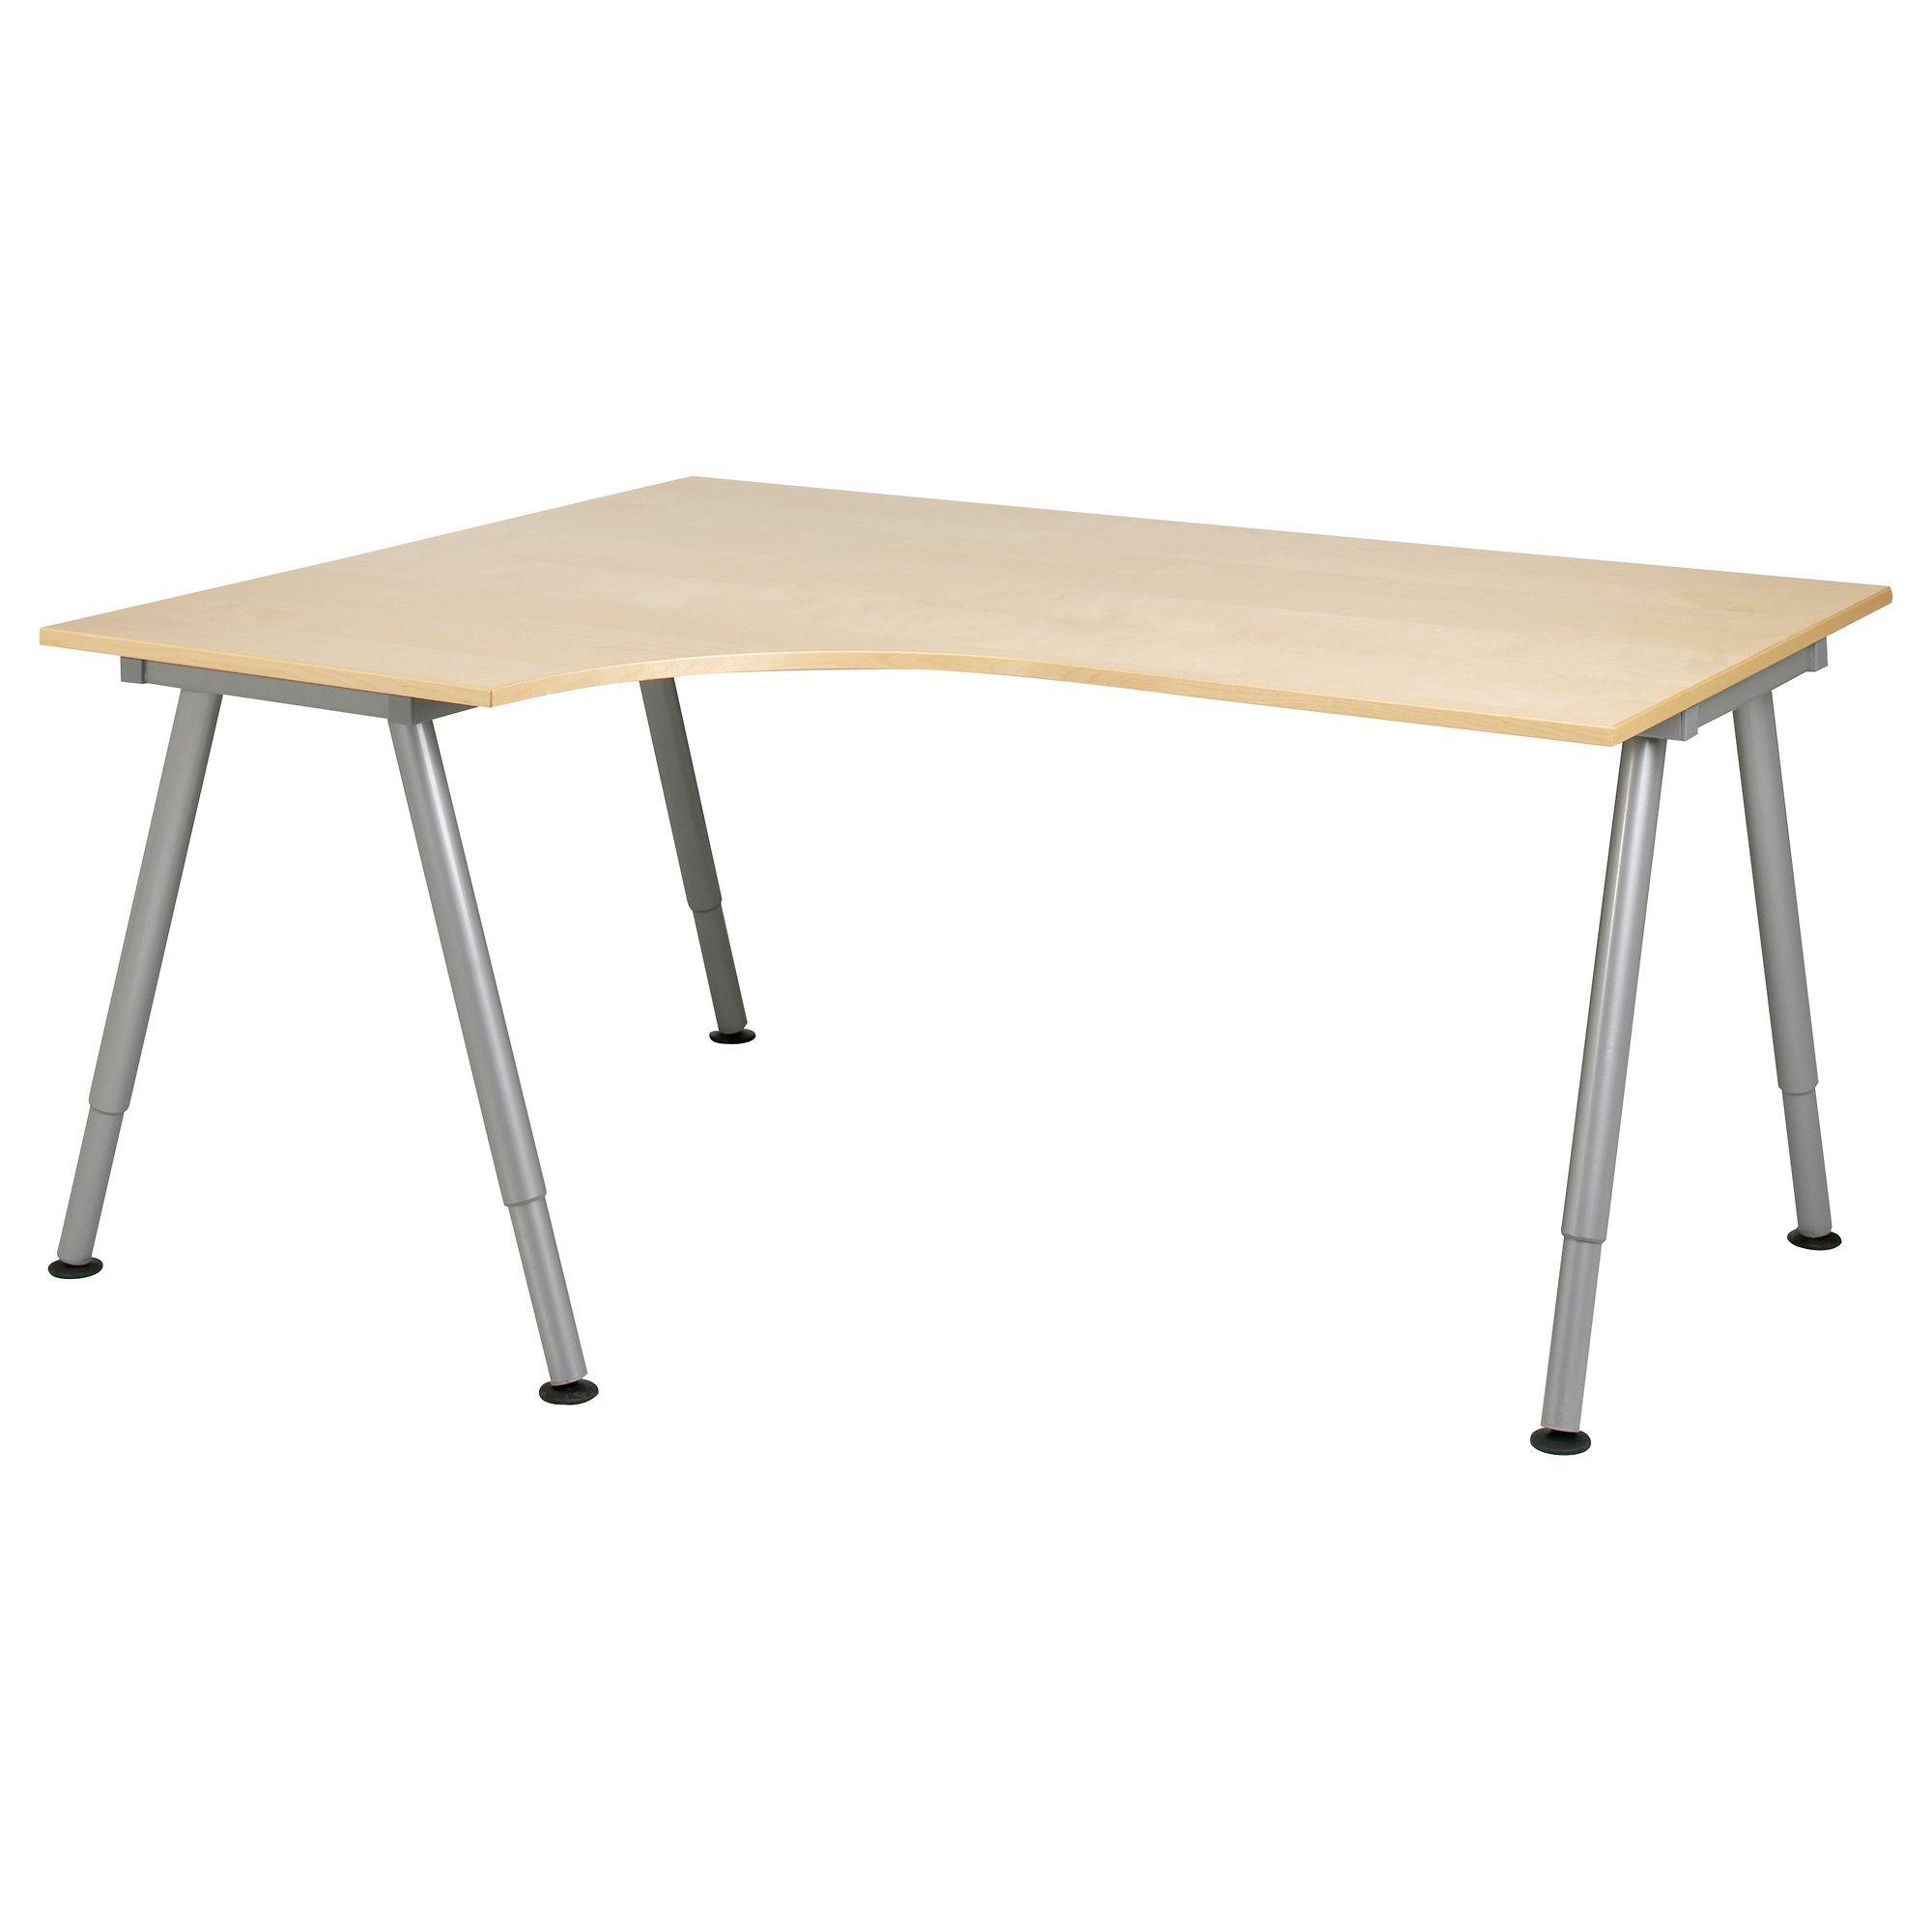 Ikea Us Furniture And Home Furnishings Ikea Galant Desk Ikea Galant Corner Desk